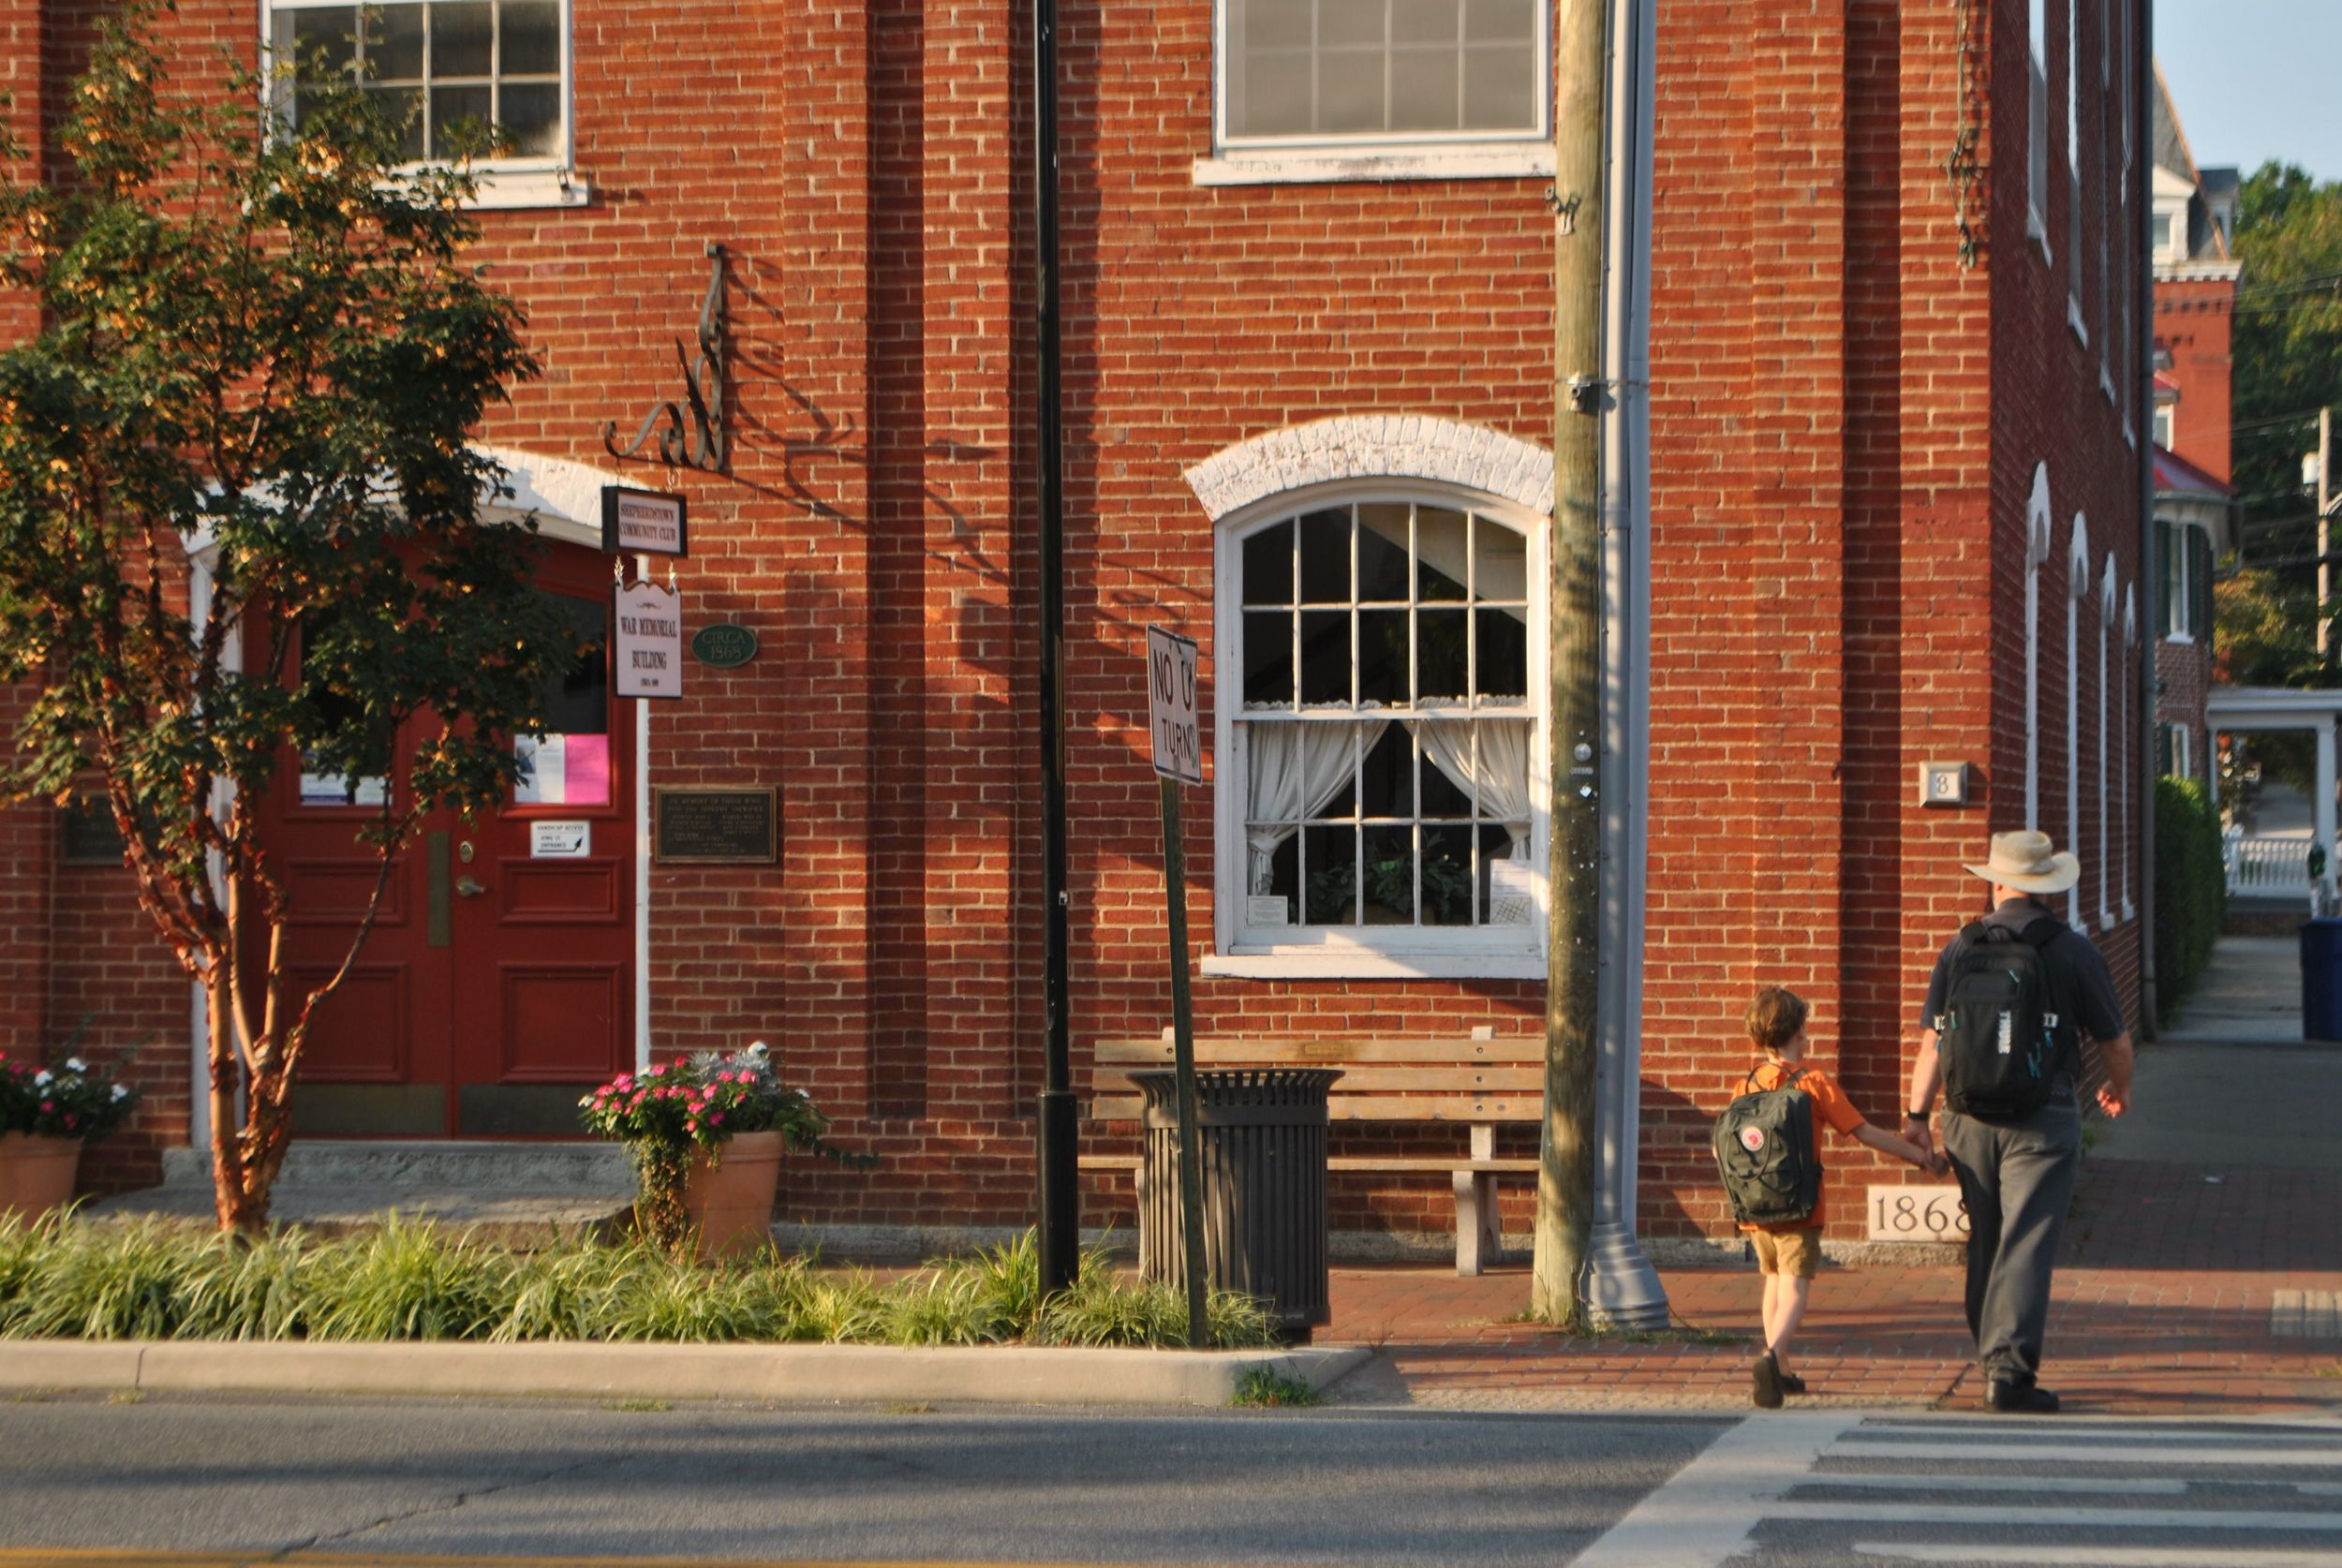 Community Center in Shepherdstown